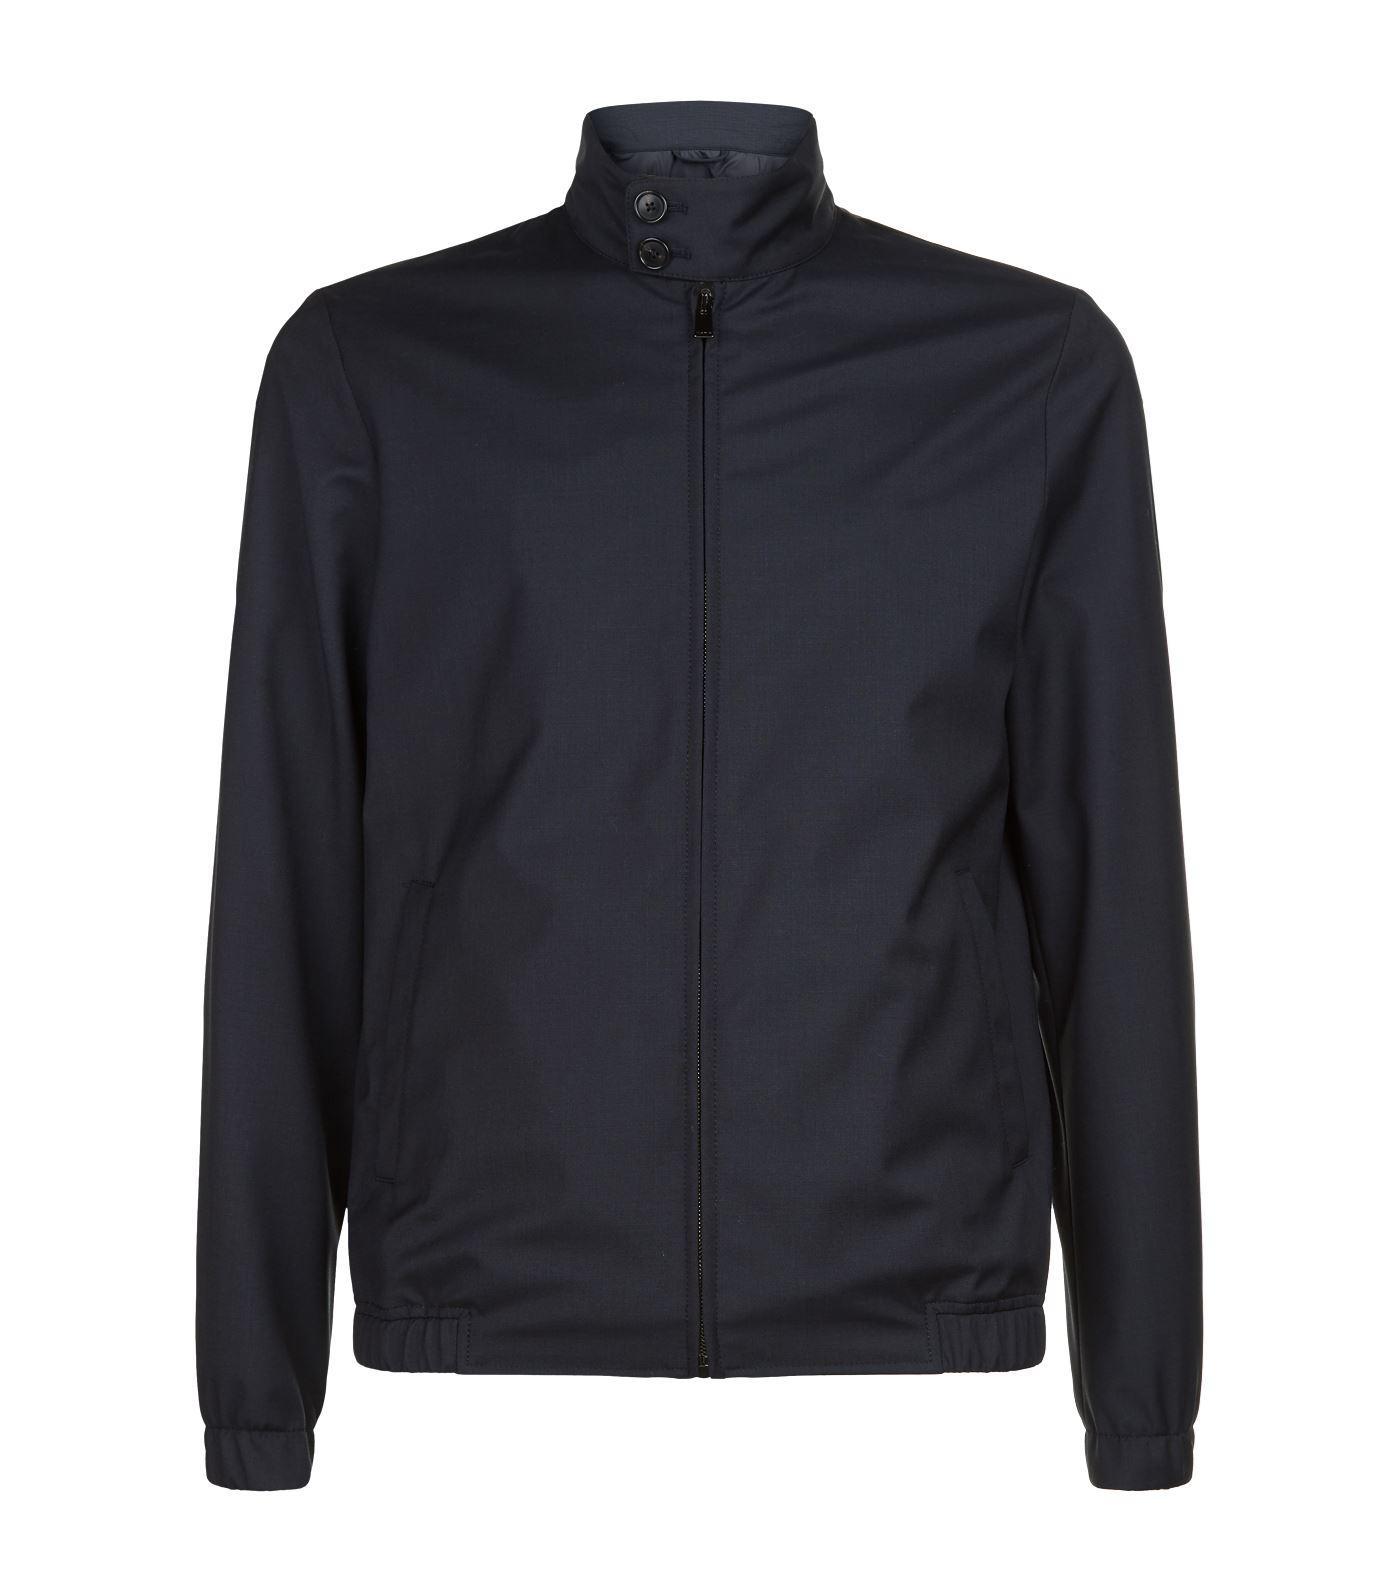 Privée Men's Blue Jacket Ewen Salle Harrington zYO7q7w